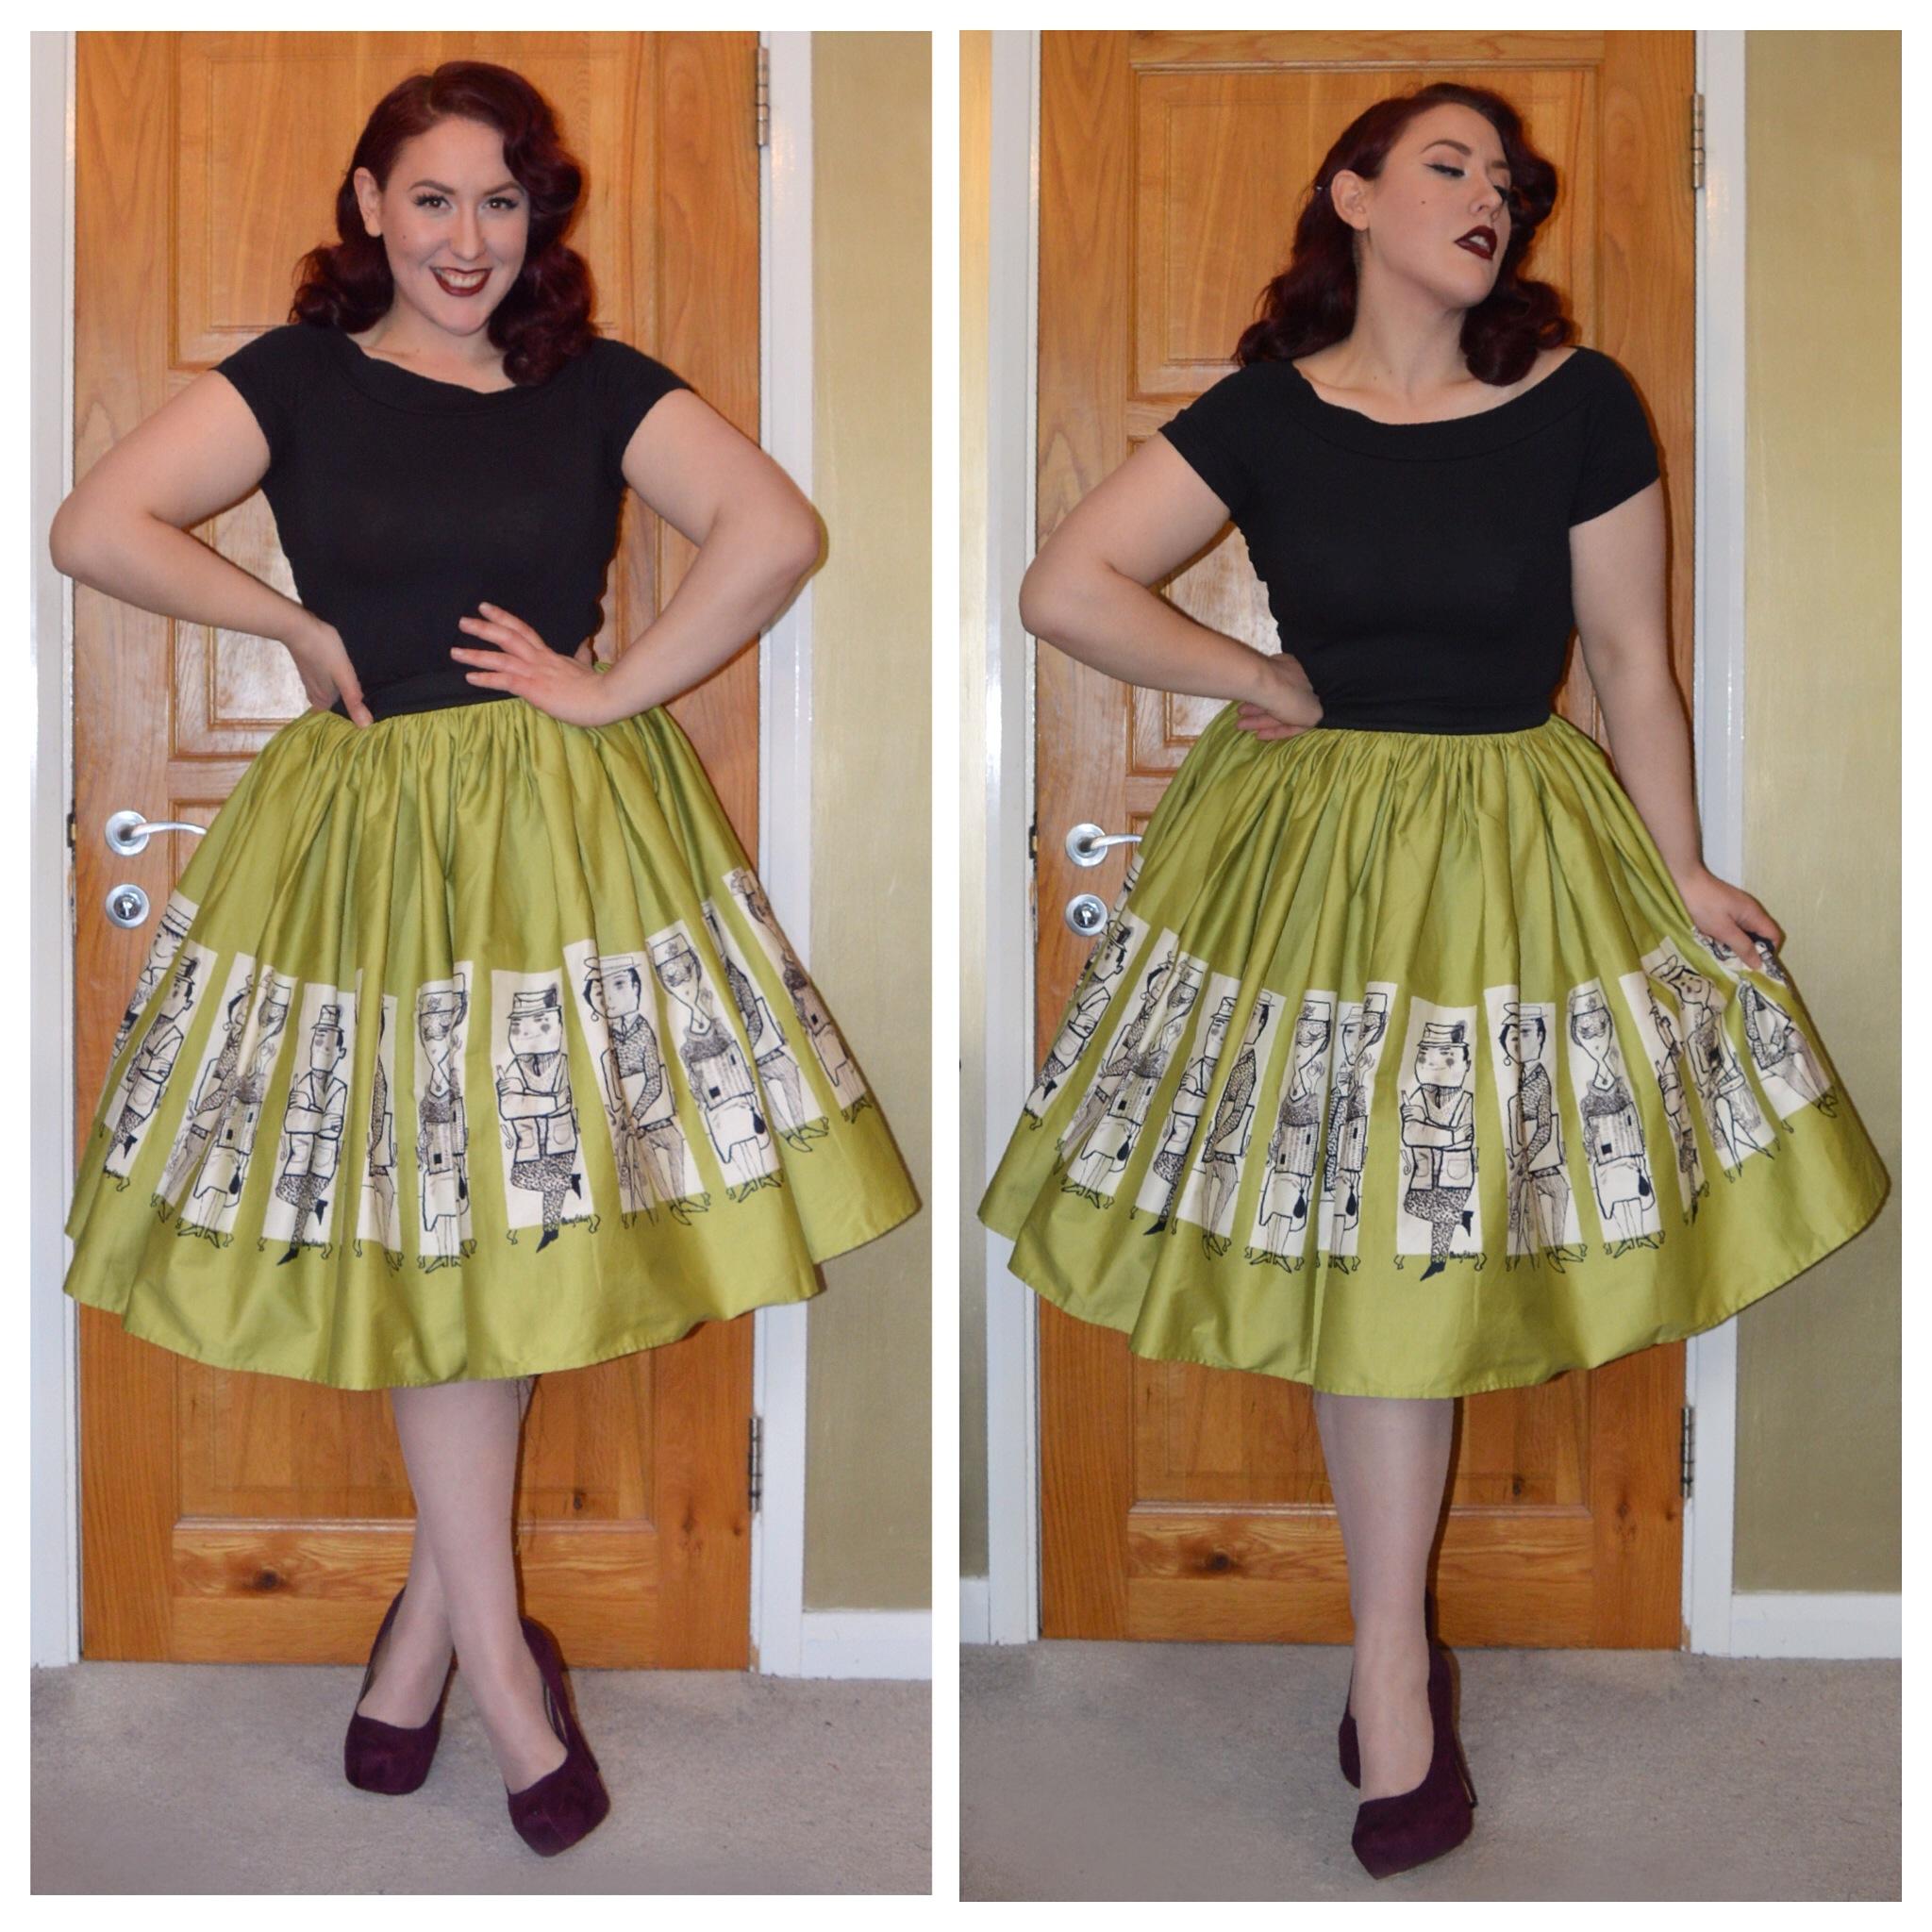 Pinup Clothing Muter Jenny Skirt Primark Scoop Neck Top Old Heels